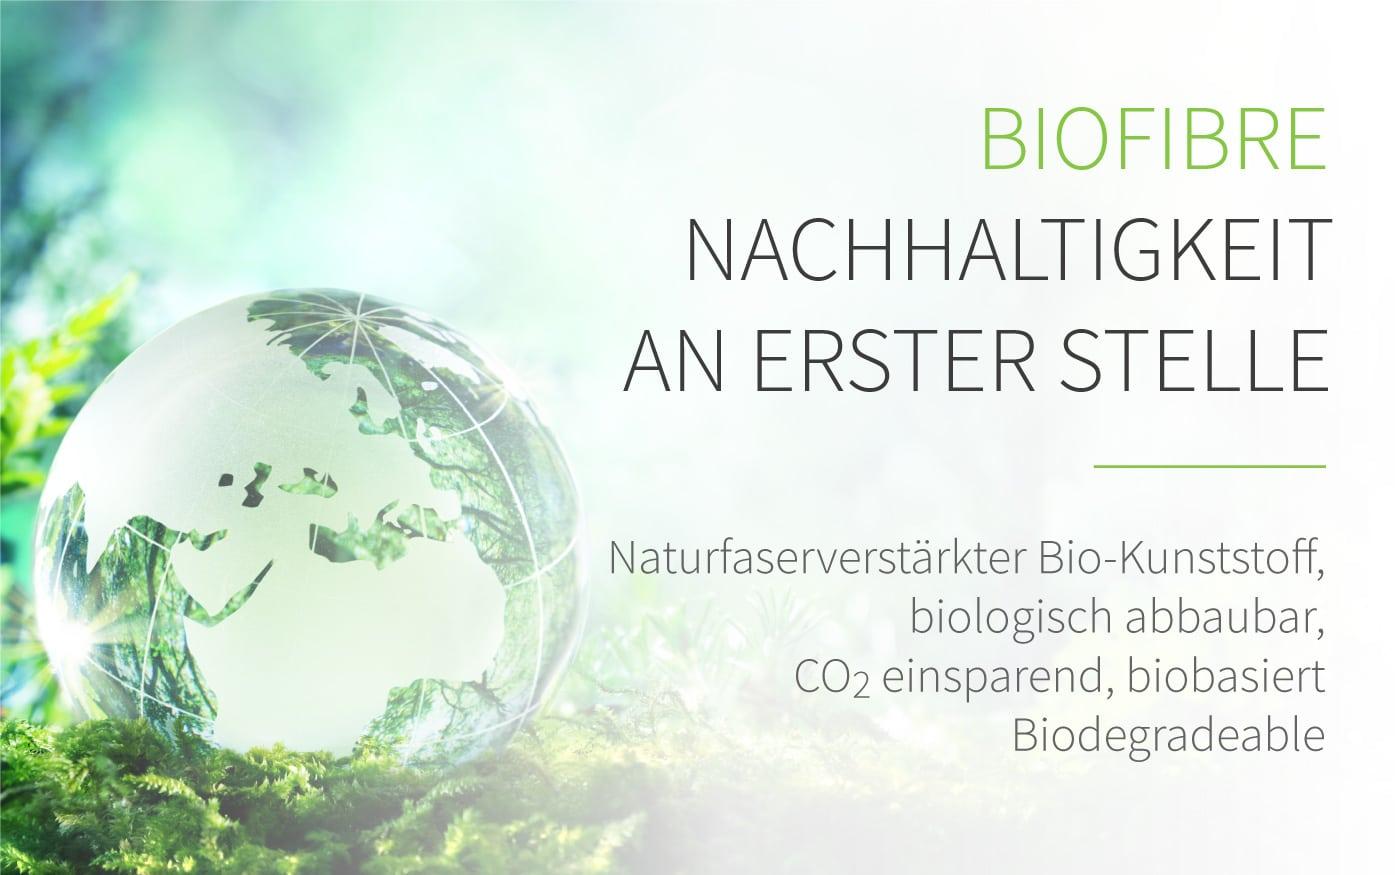 Biofibre